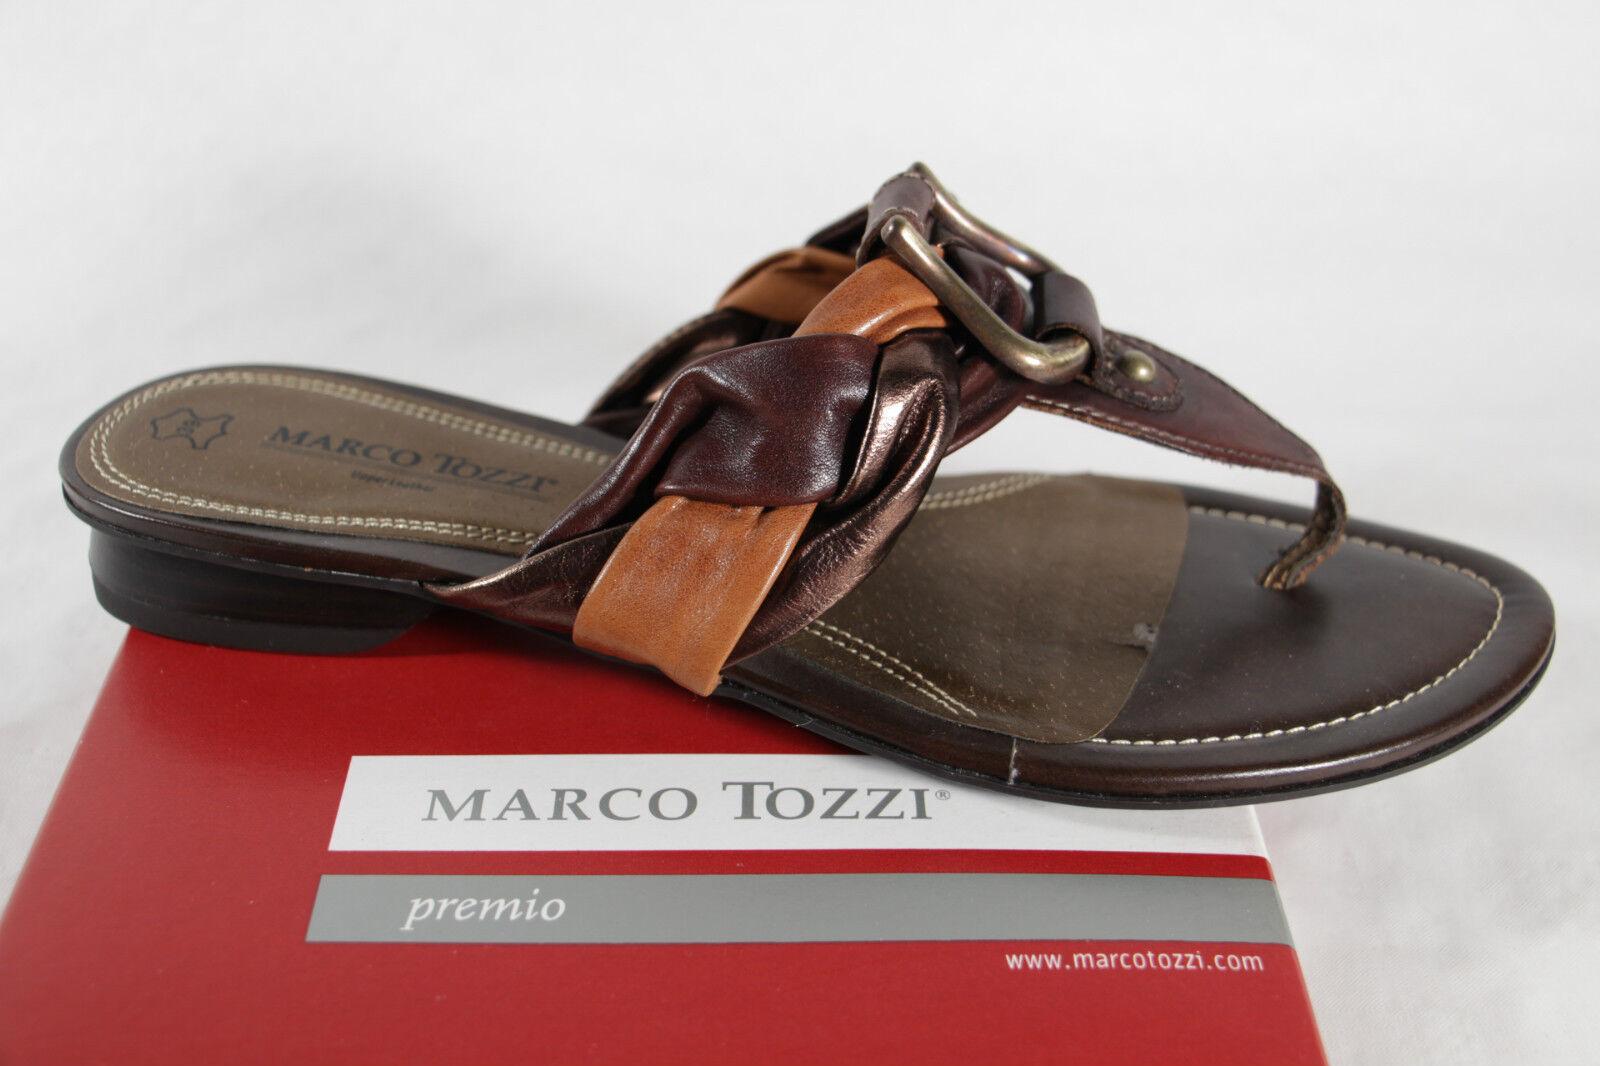 Marco Tozzi Toe Sandal, Brown New